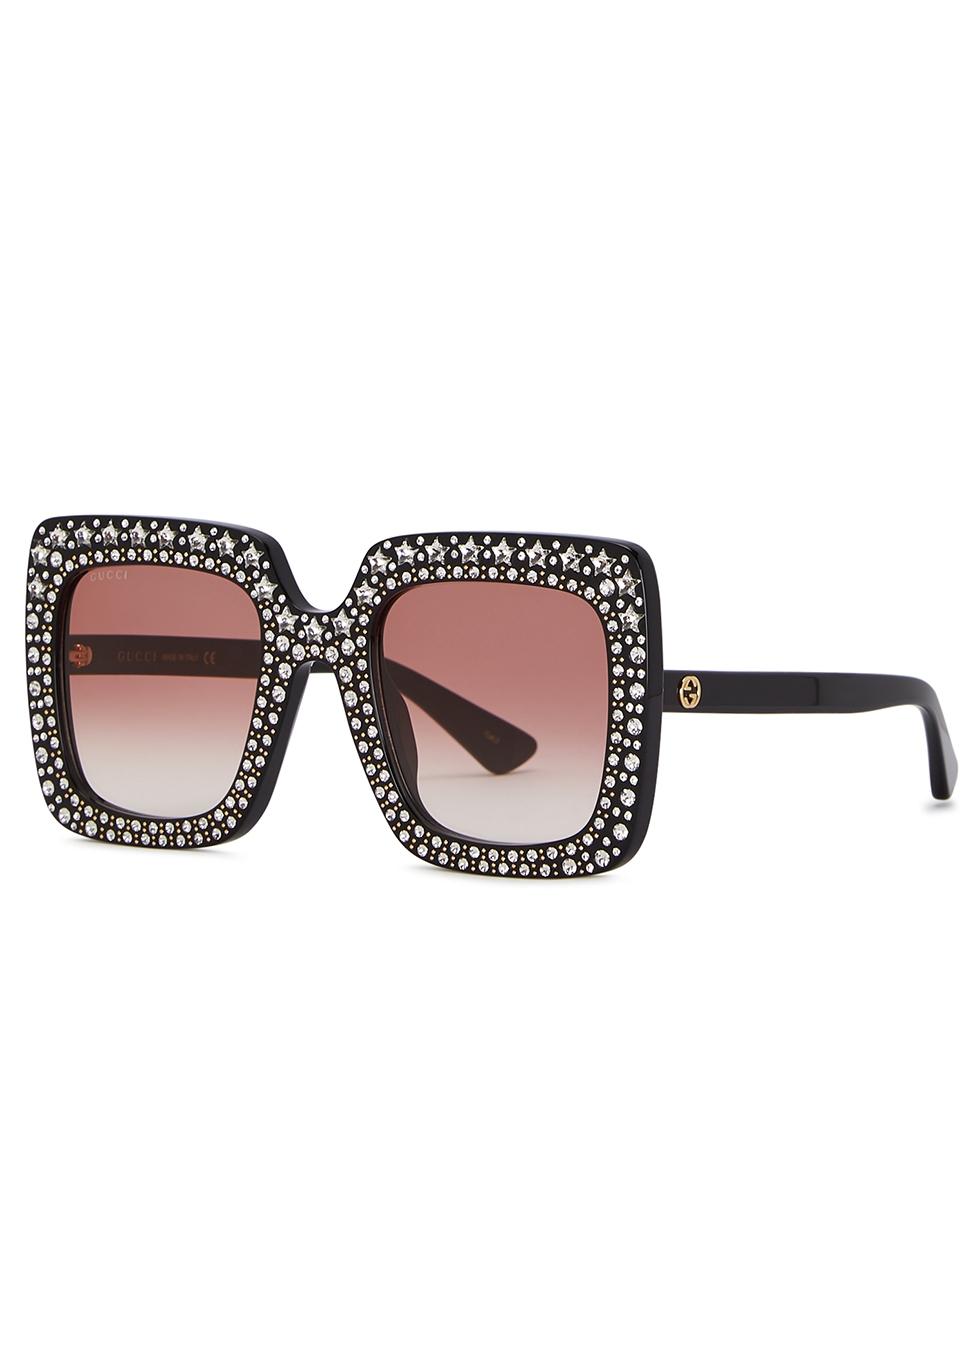 97fd8e2be3 Gucci Wayfarer Sunglasses Deep Grey Silver Black